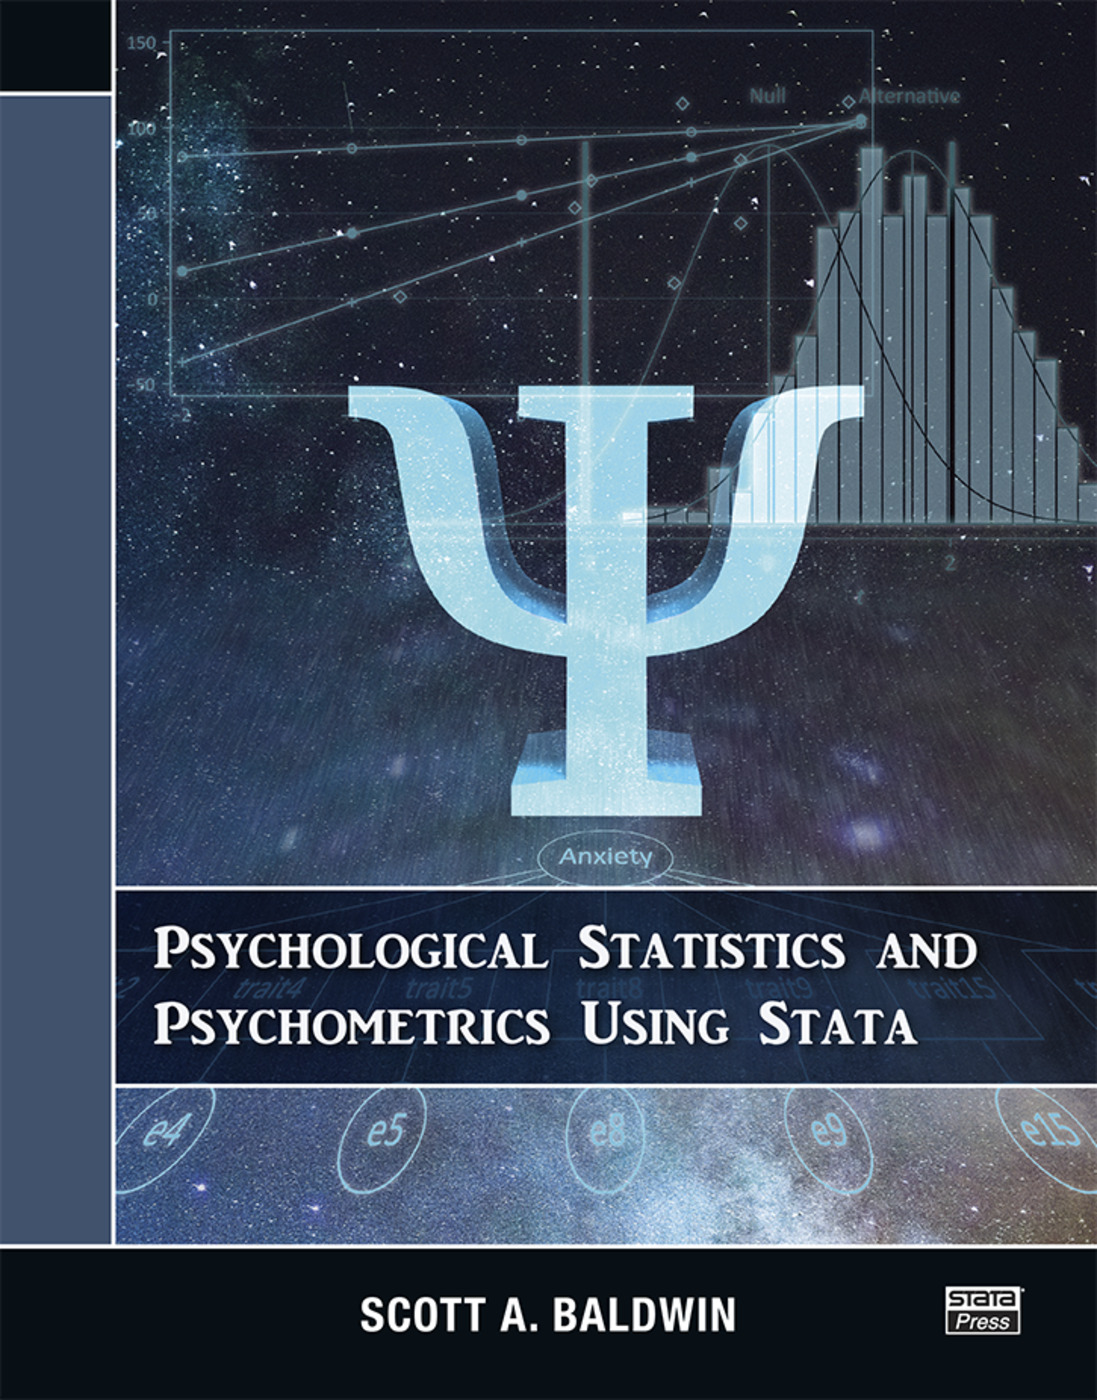 Psychological Statistics and Psychometrics Using Stata book cover